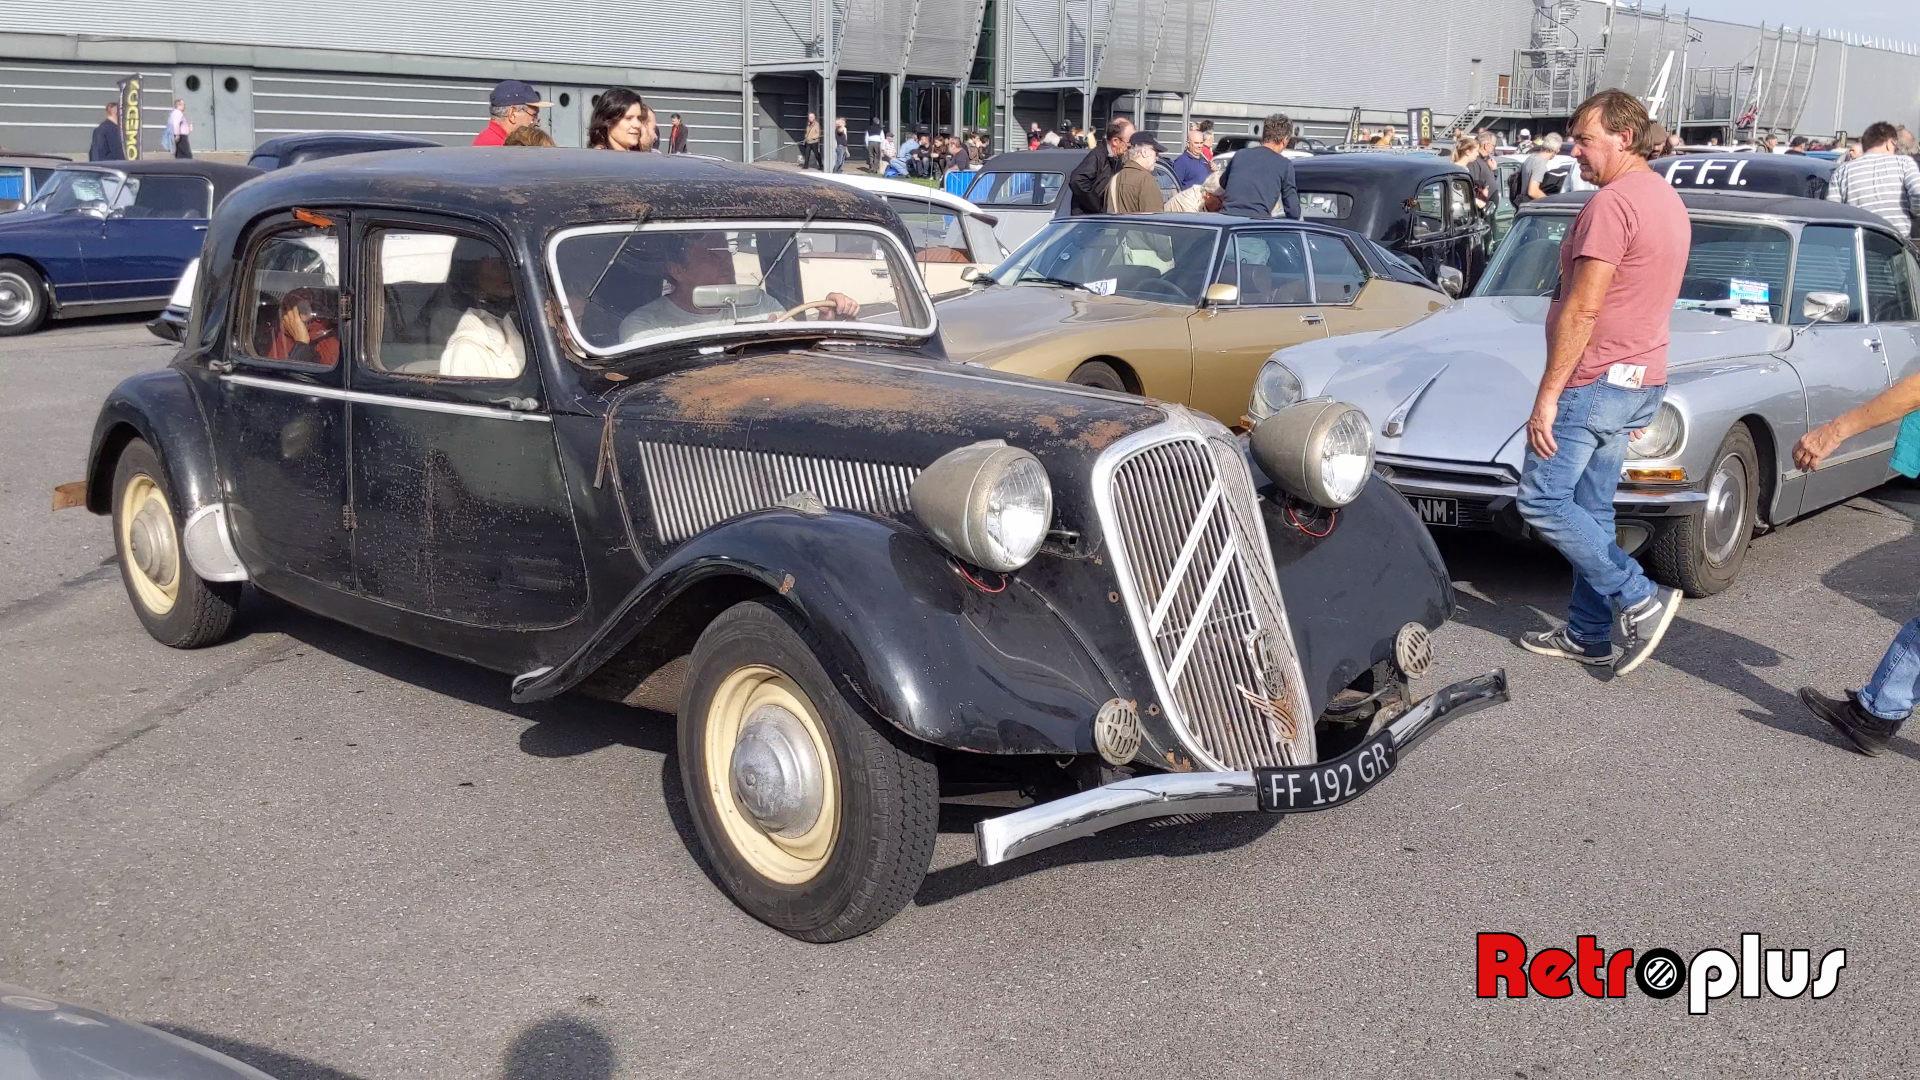 Automedon2019-parkingCitroen21